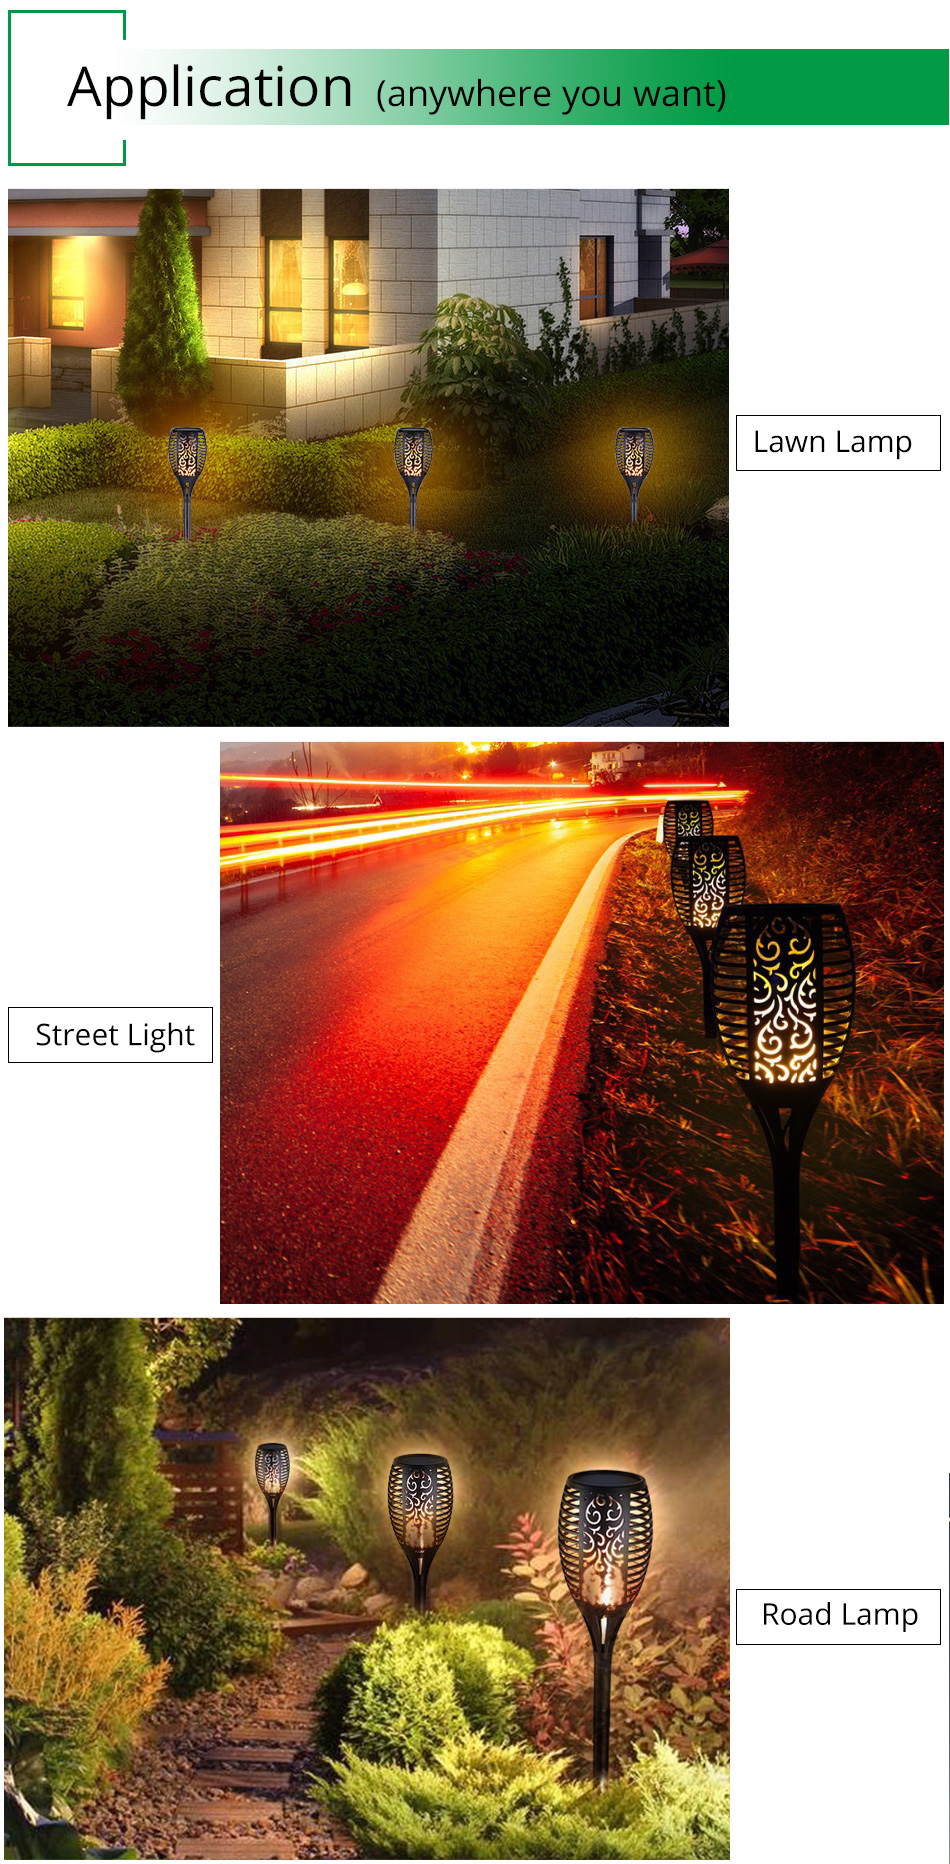 LED Flame Lamp Solar Waterproof Lawn Light Dancing Flickering Torch Lights Garden Outdoor Landscape Decorative Path Lighting (12)